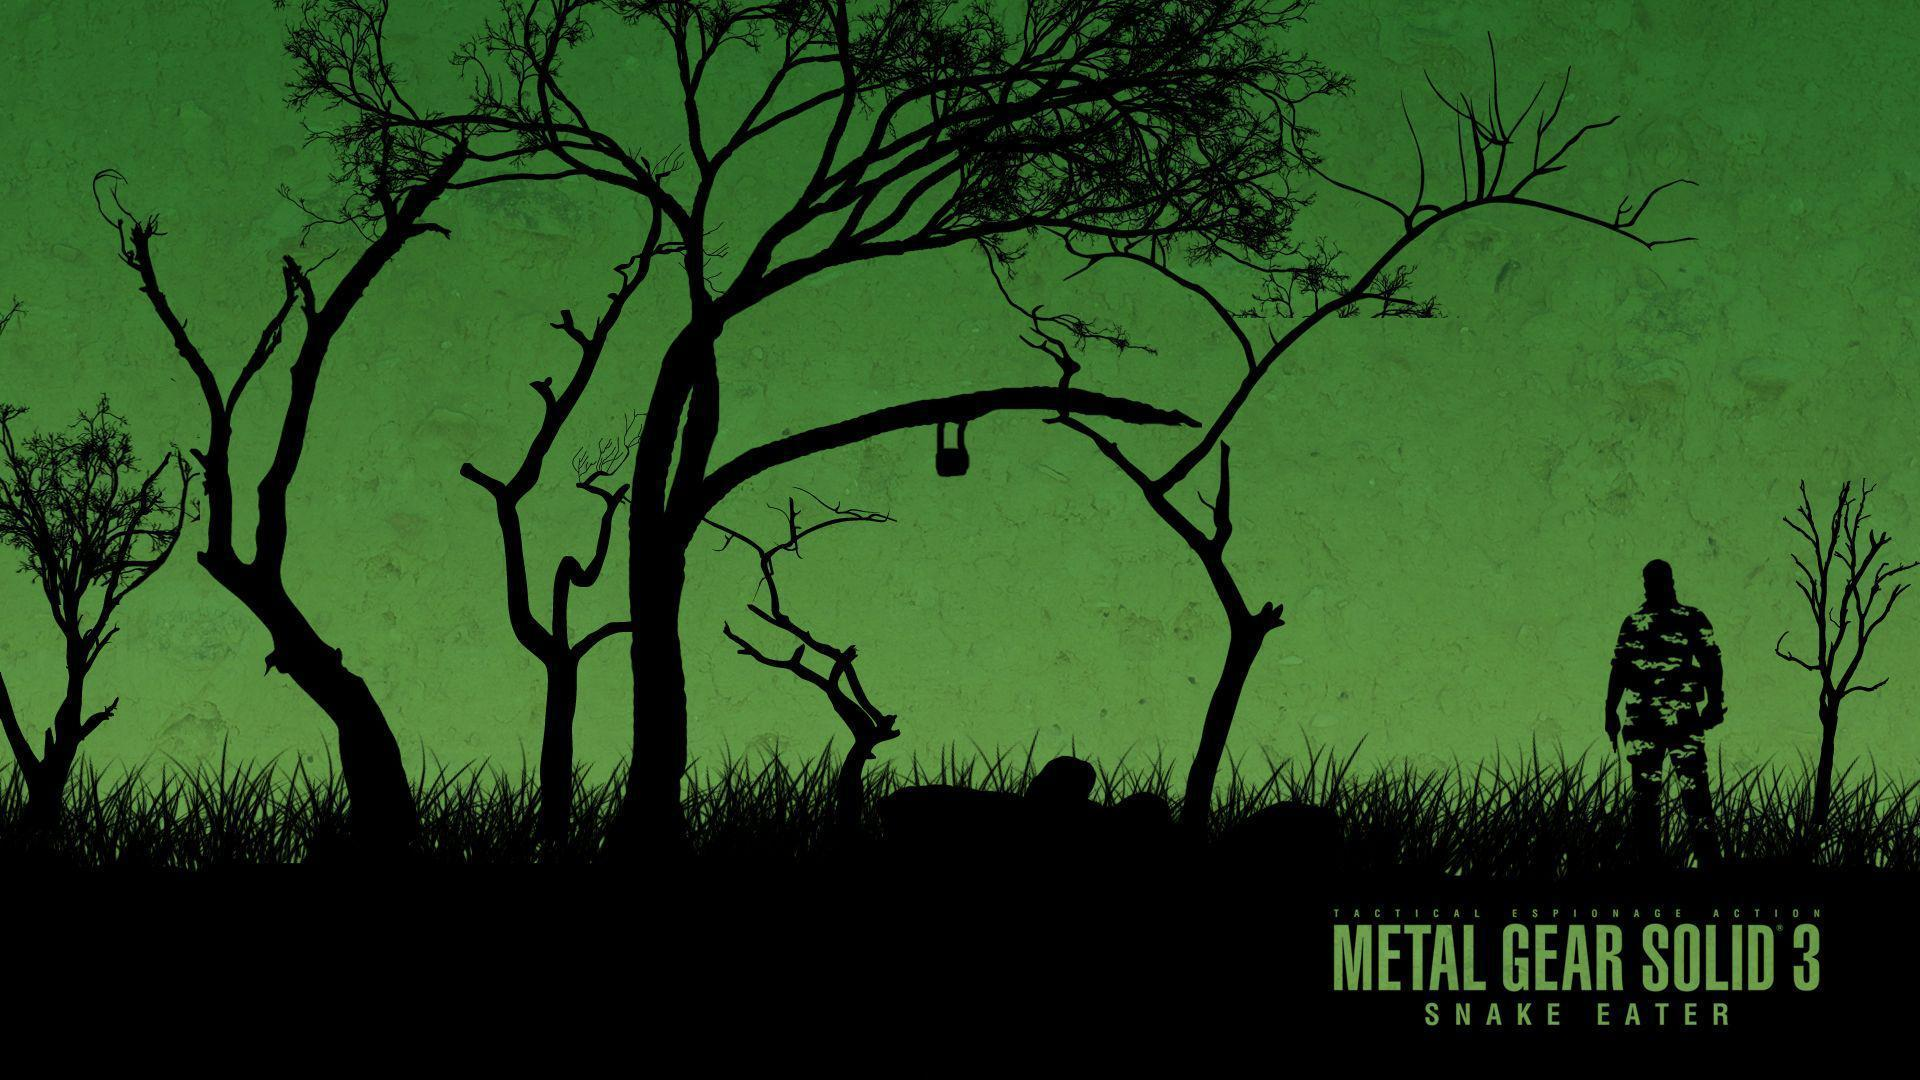 Metal Gear Solid 3 Wallpapers Wallpaper Cave